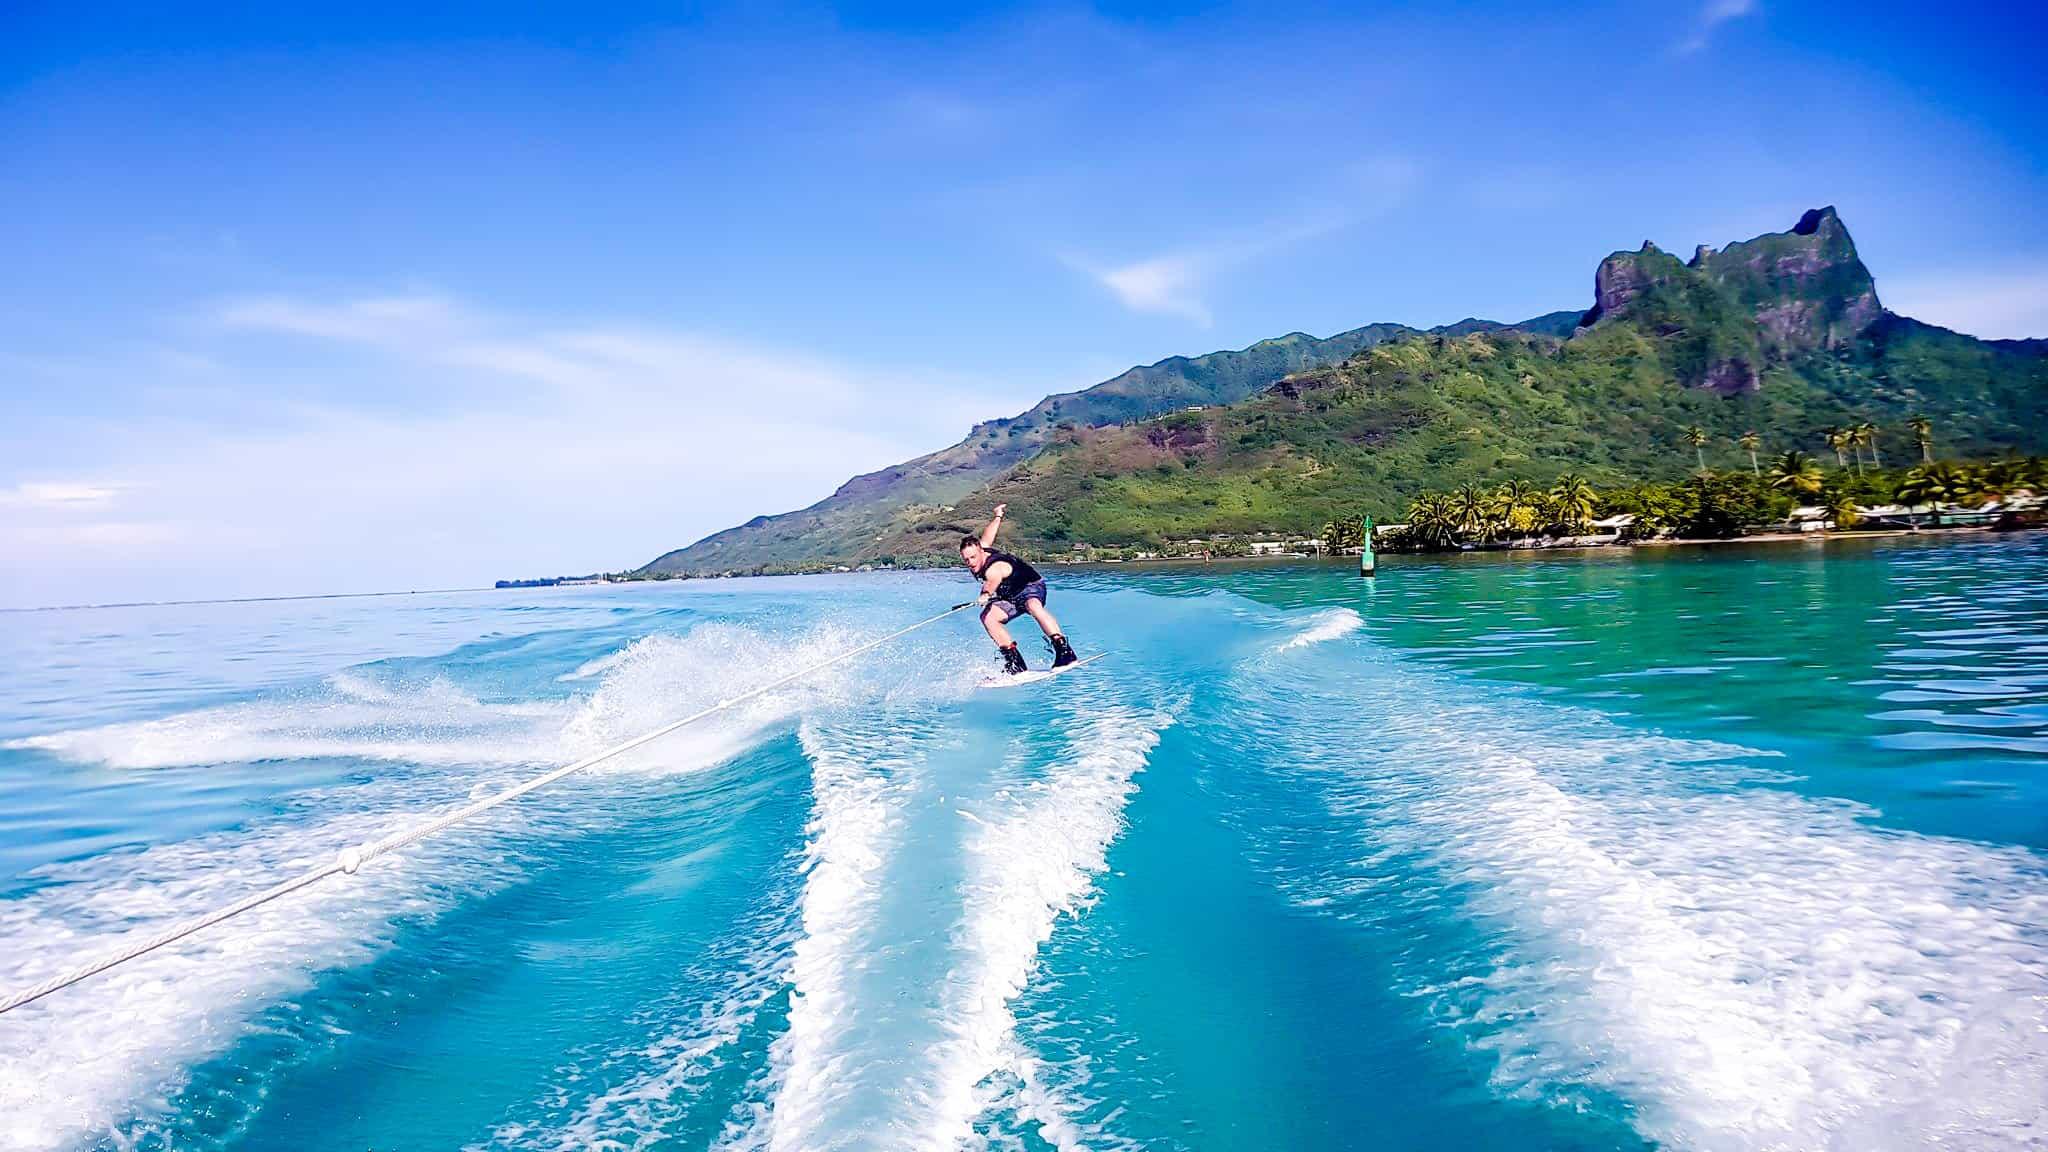 wakeboard-1